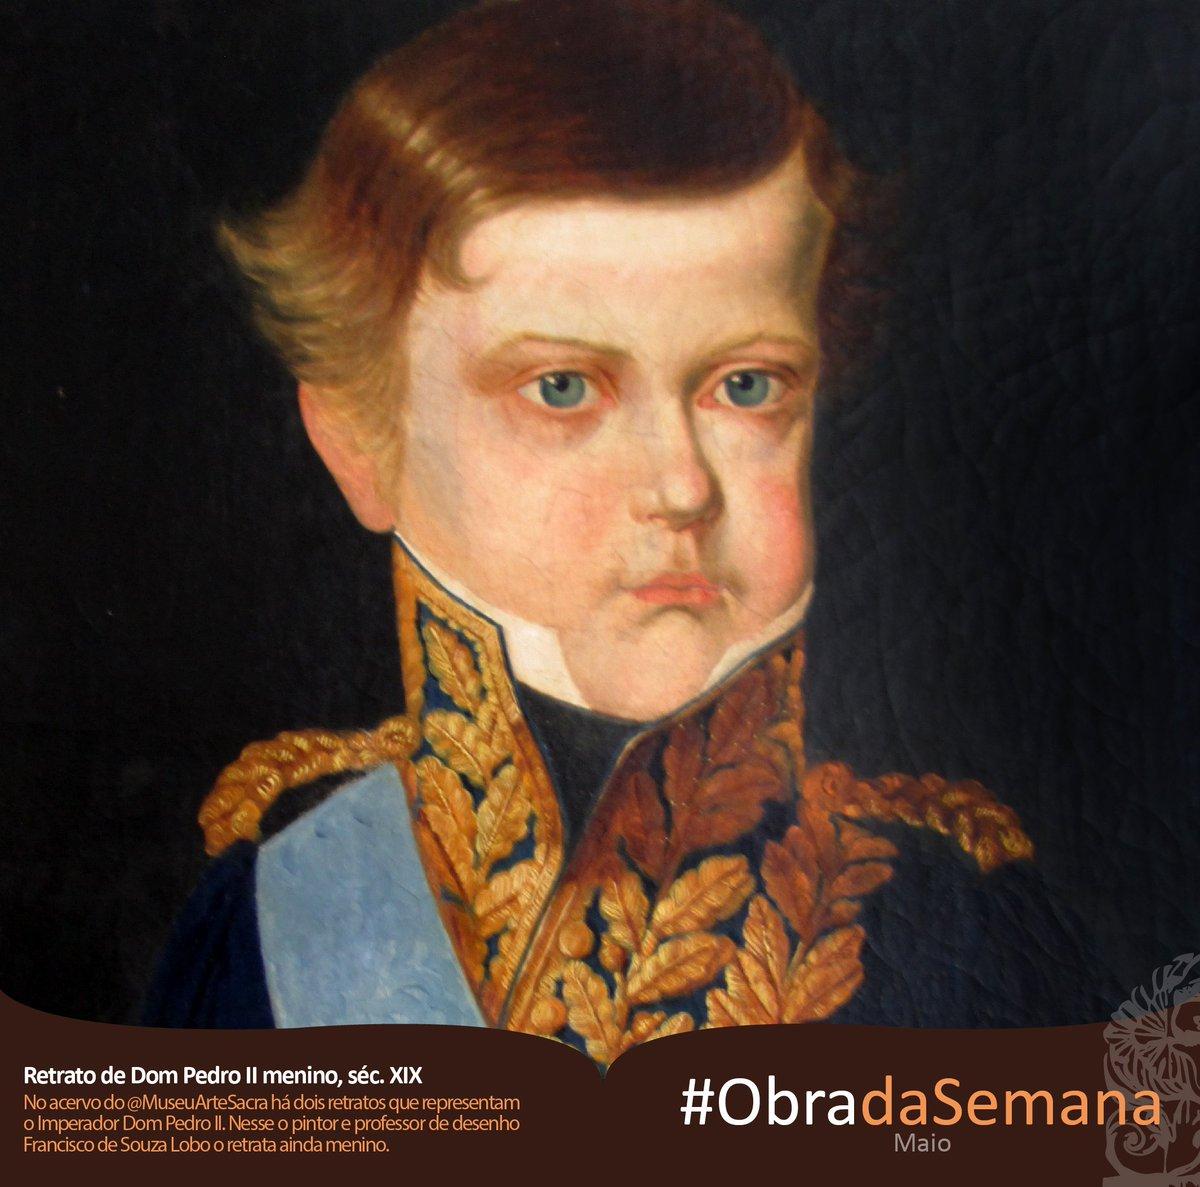 Museu De Arte Sacra En Twitter Que Tal Conferir Um Retrato De